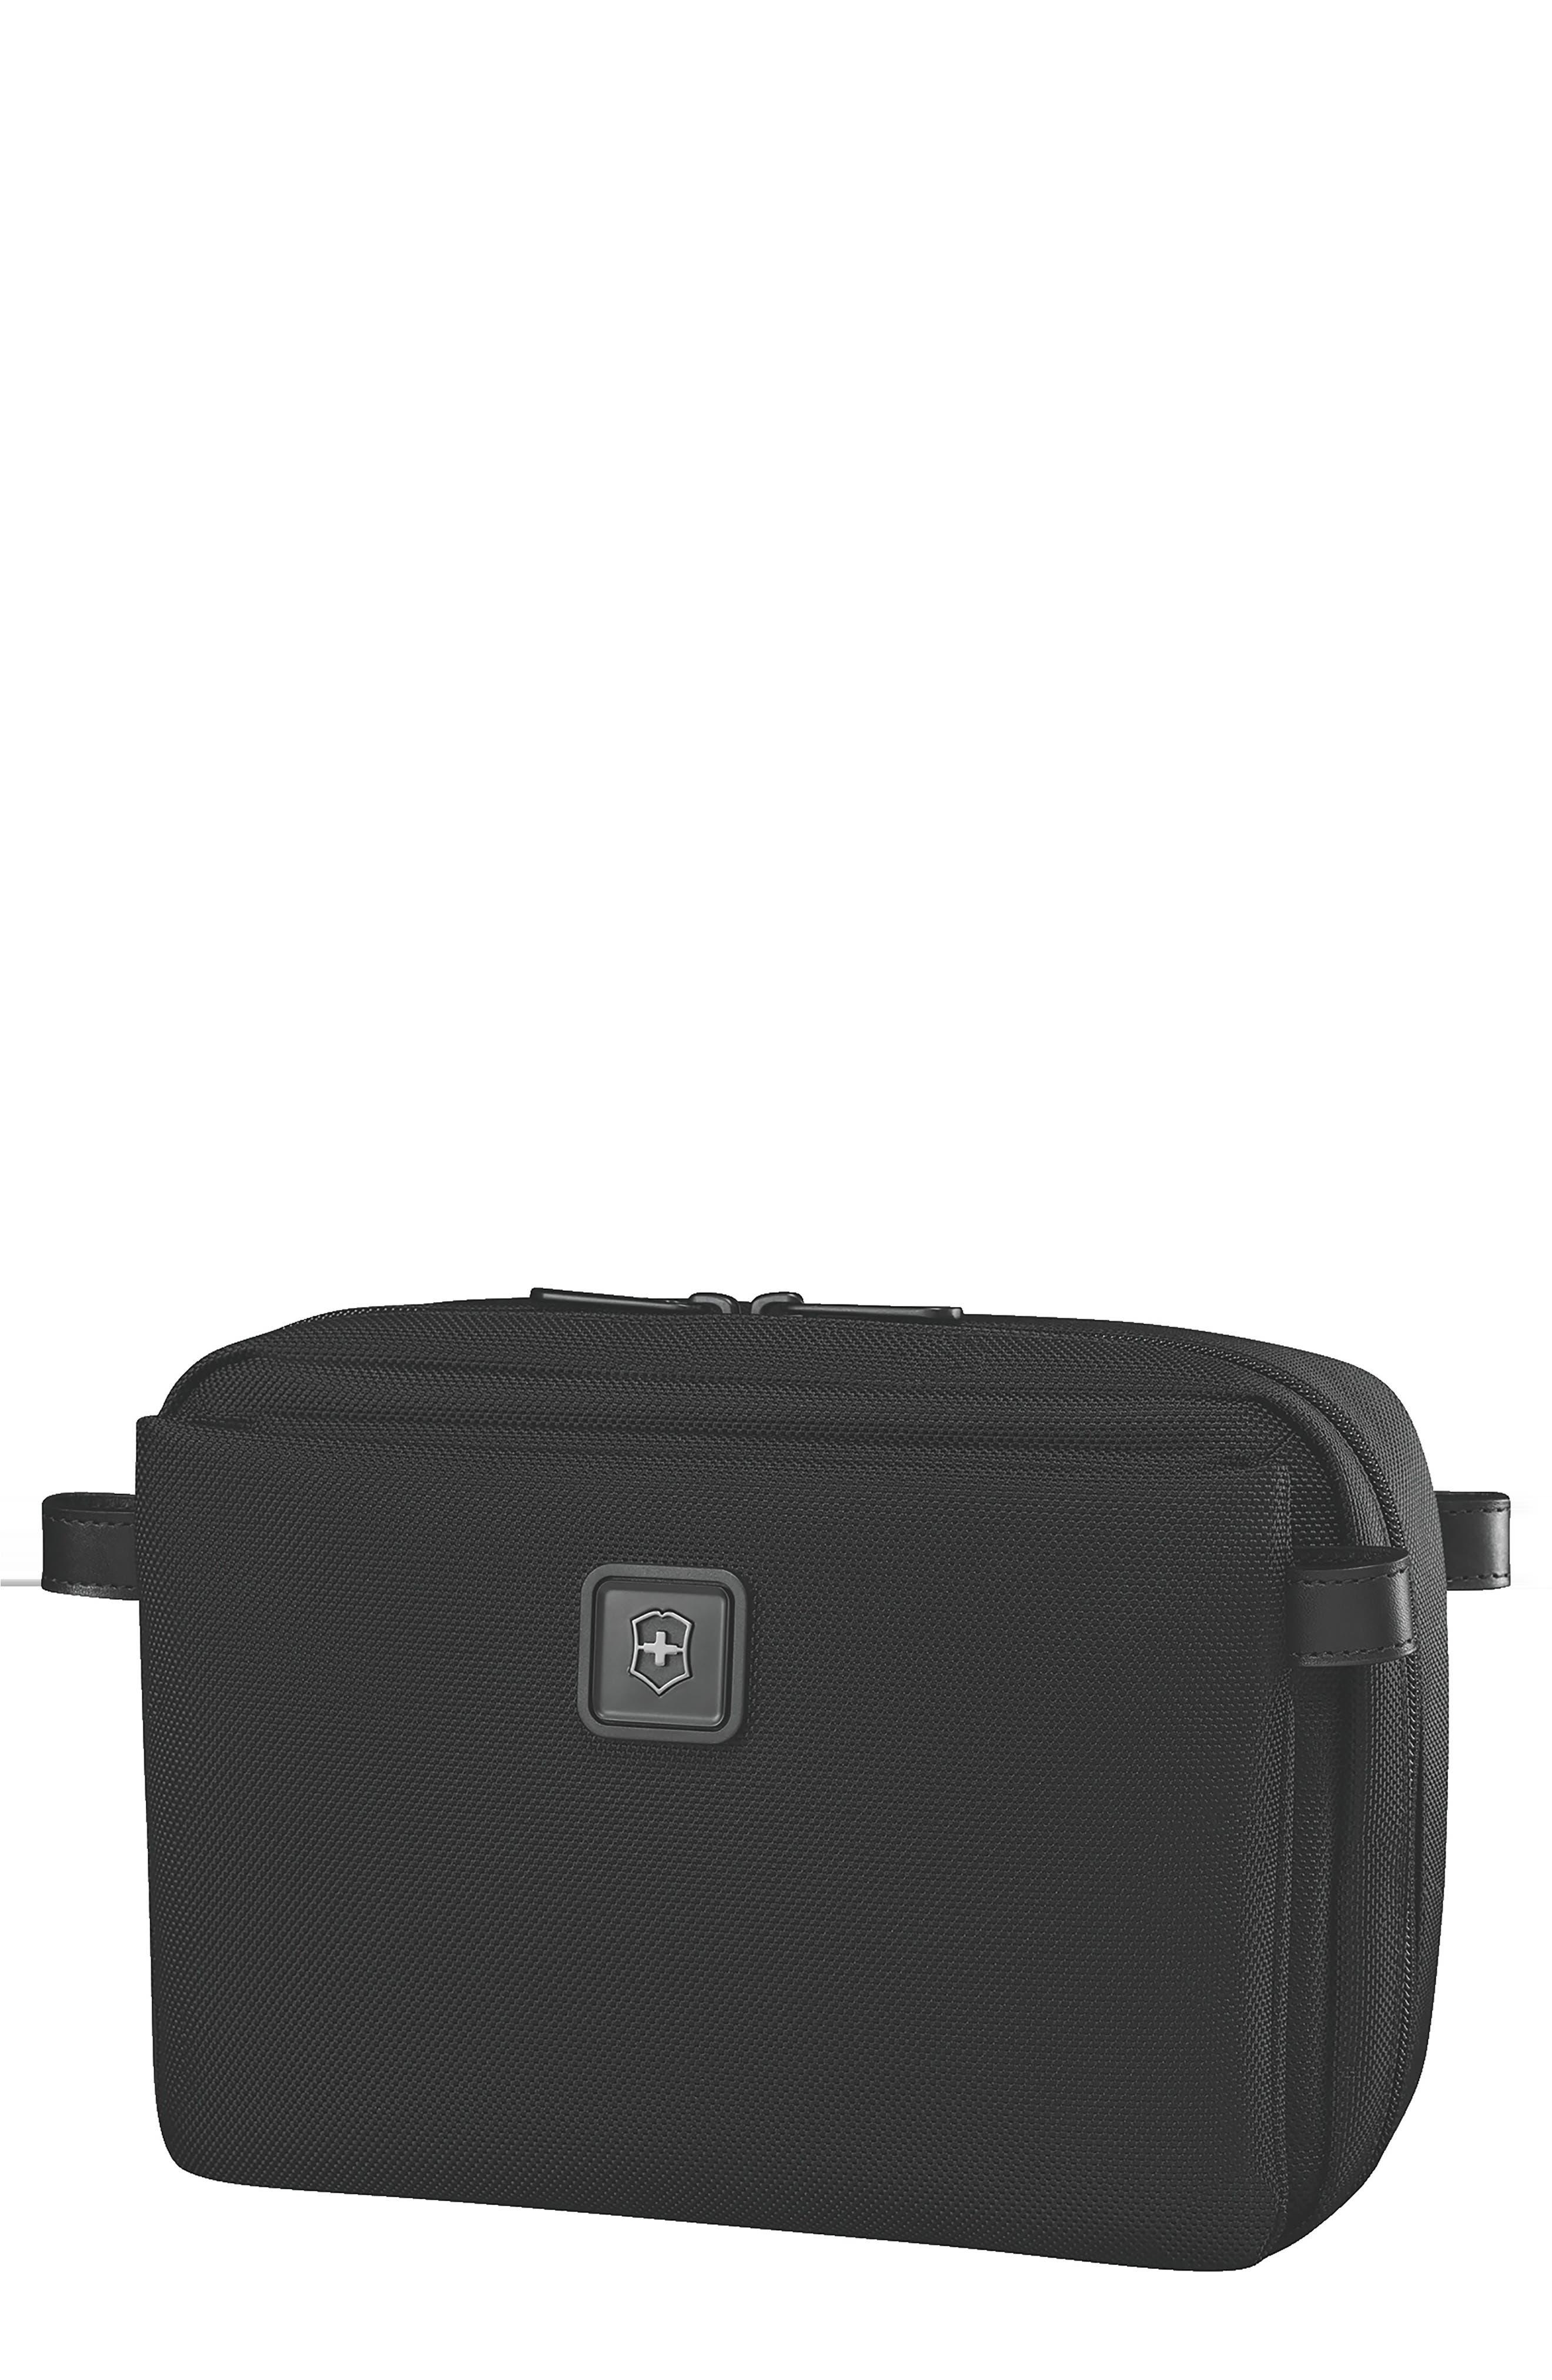 Lexicon 2.0 Travel Kit,                             Main thumbnail 1, color,